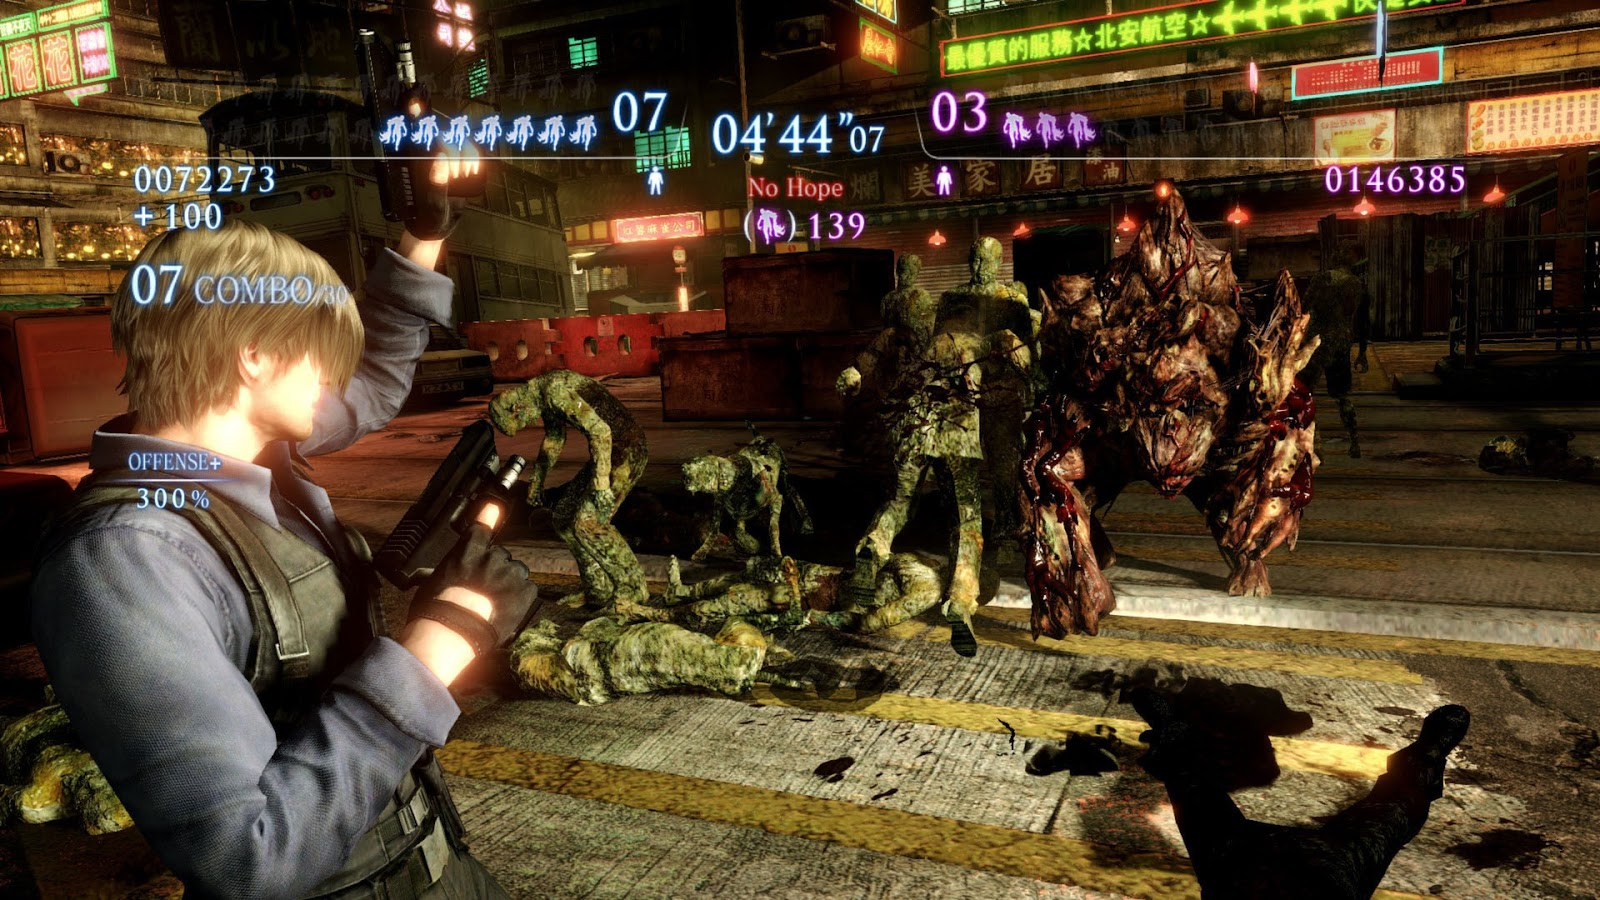 Resident Evil 6 HIGHLY COMPRESSED 3MB - High Compress Games